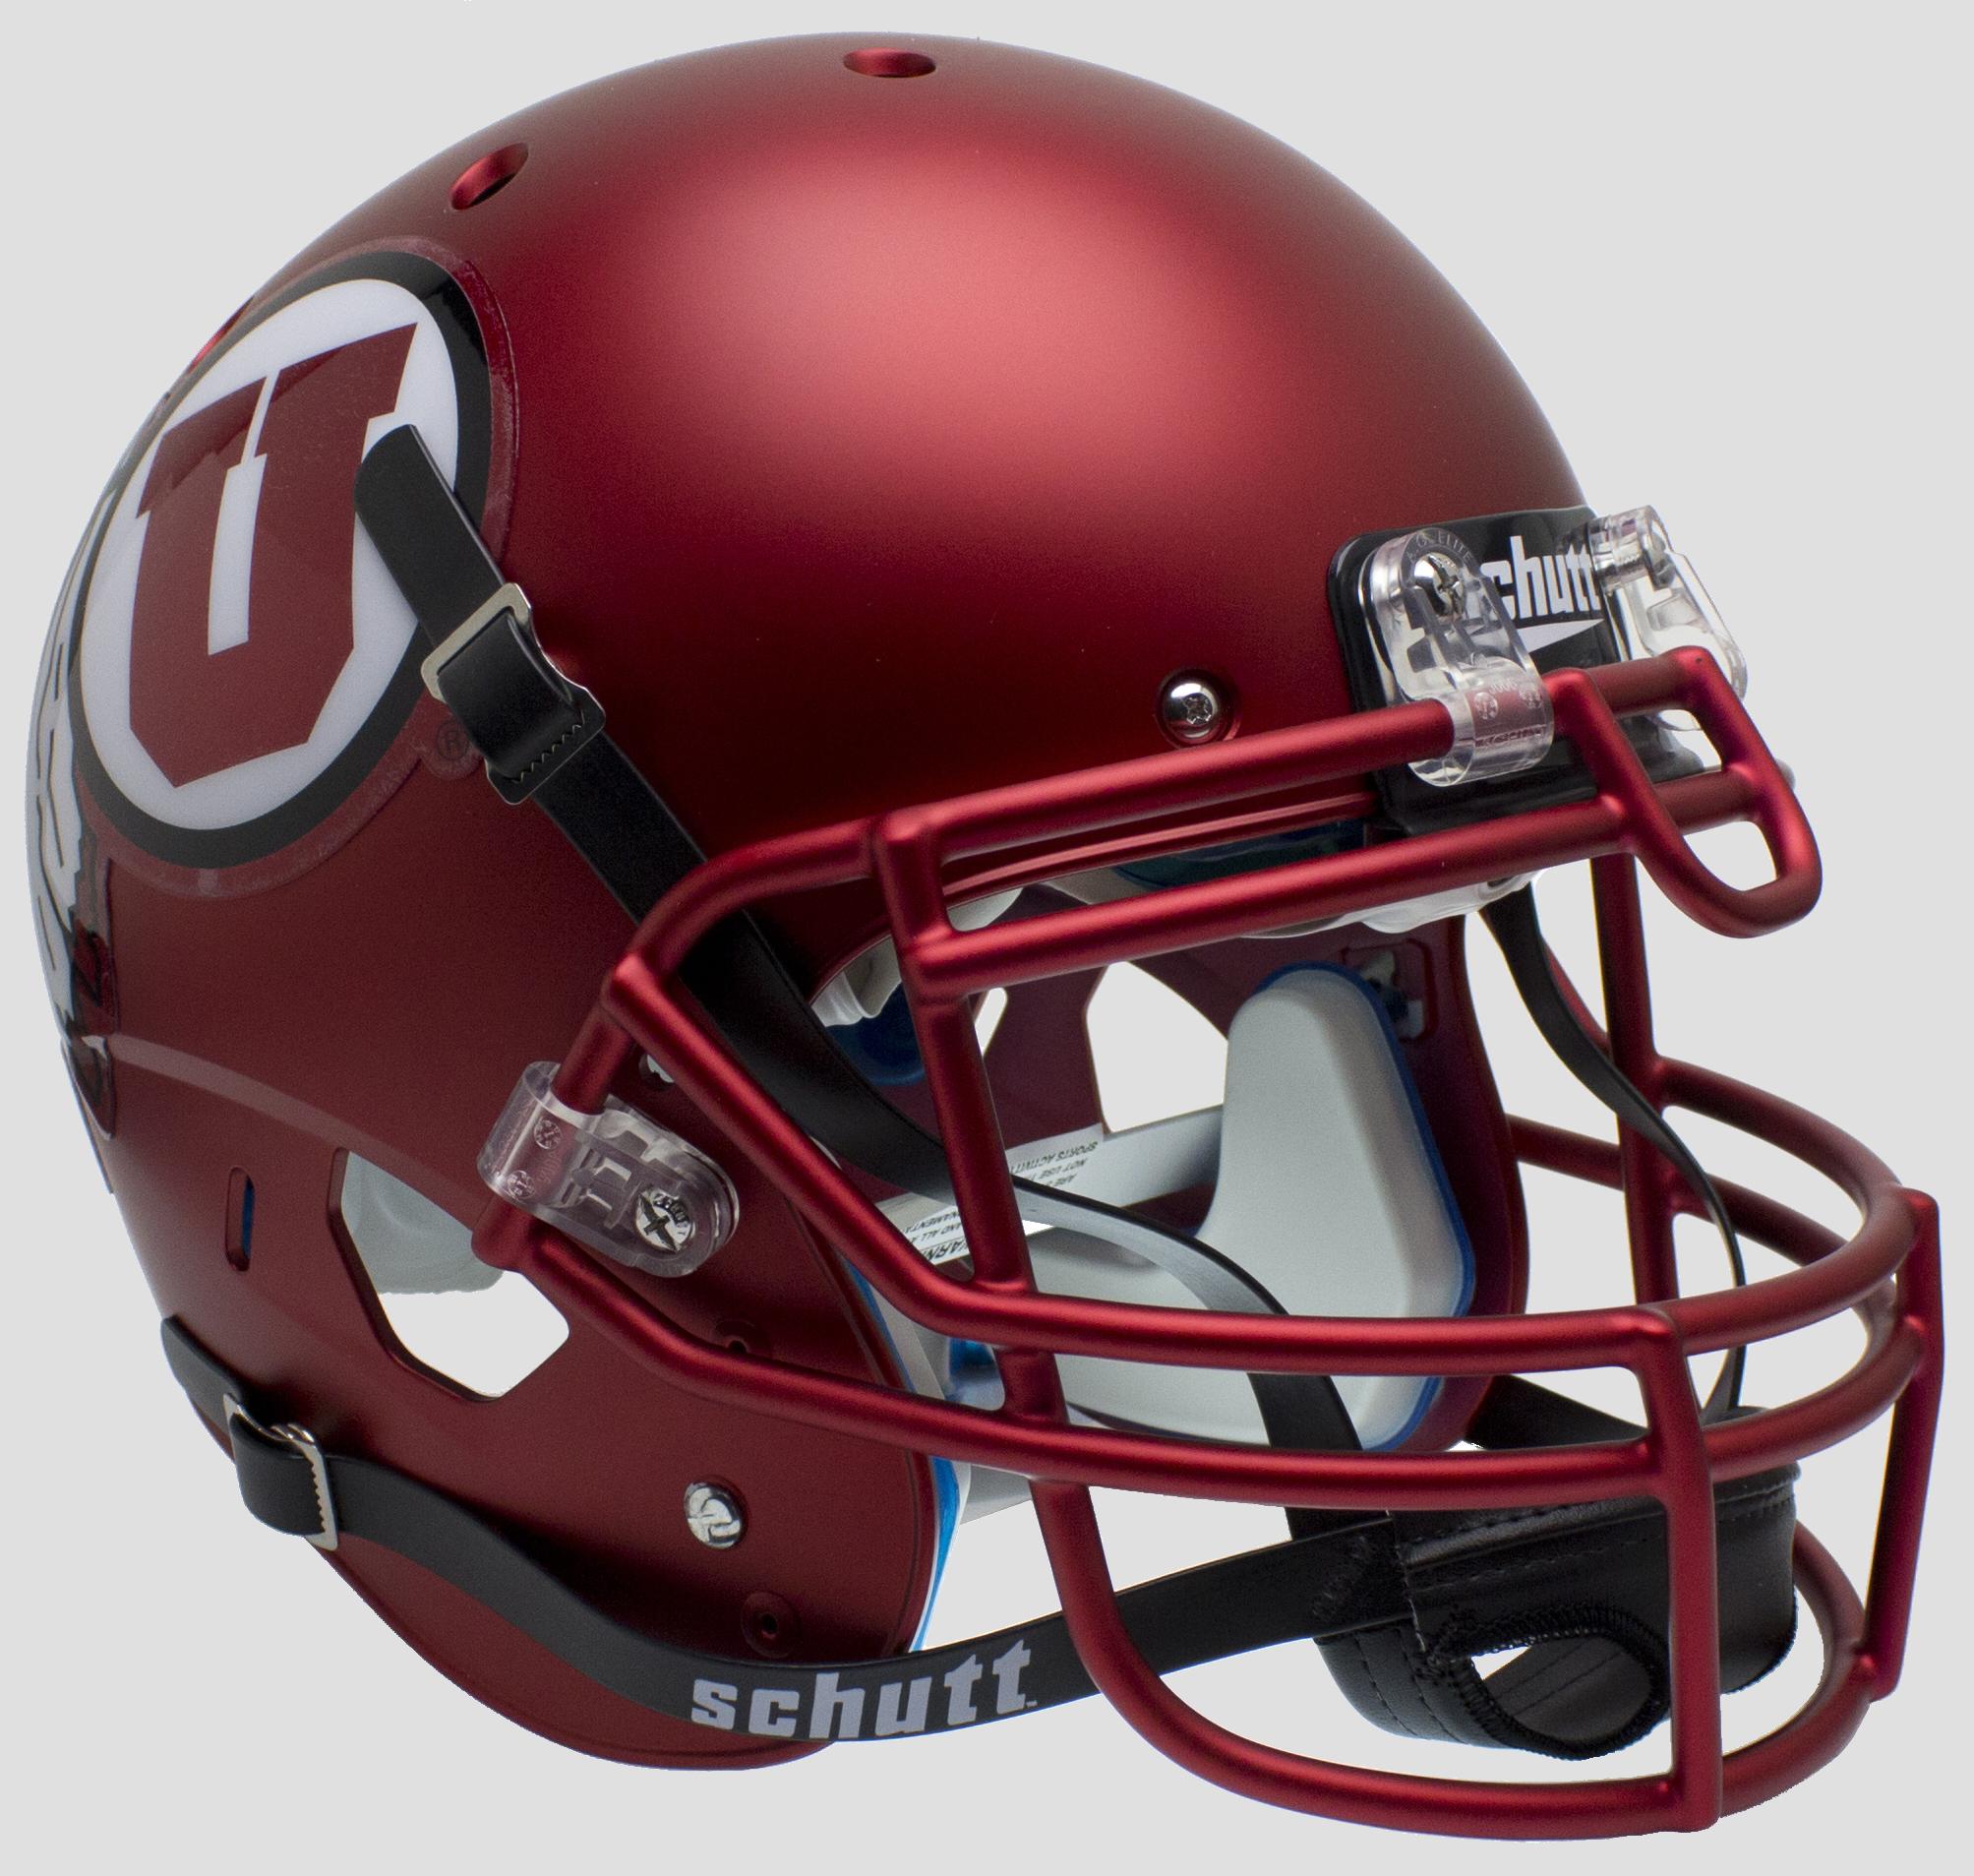 Utah Utes Authentic College XP Football Helmet Schutt <B>Satin Red<B>